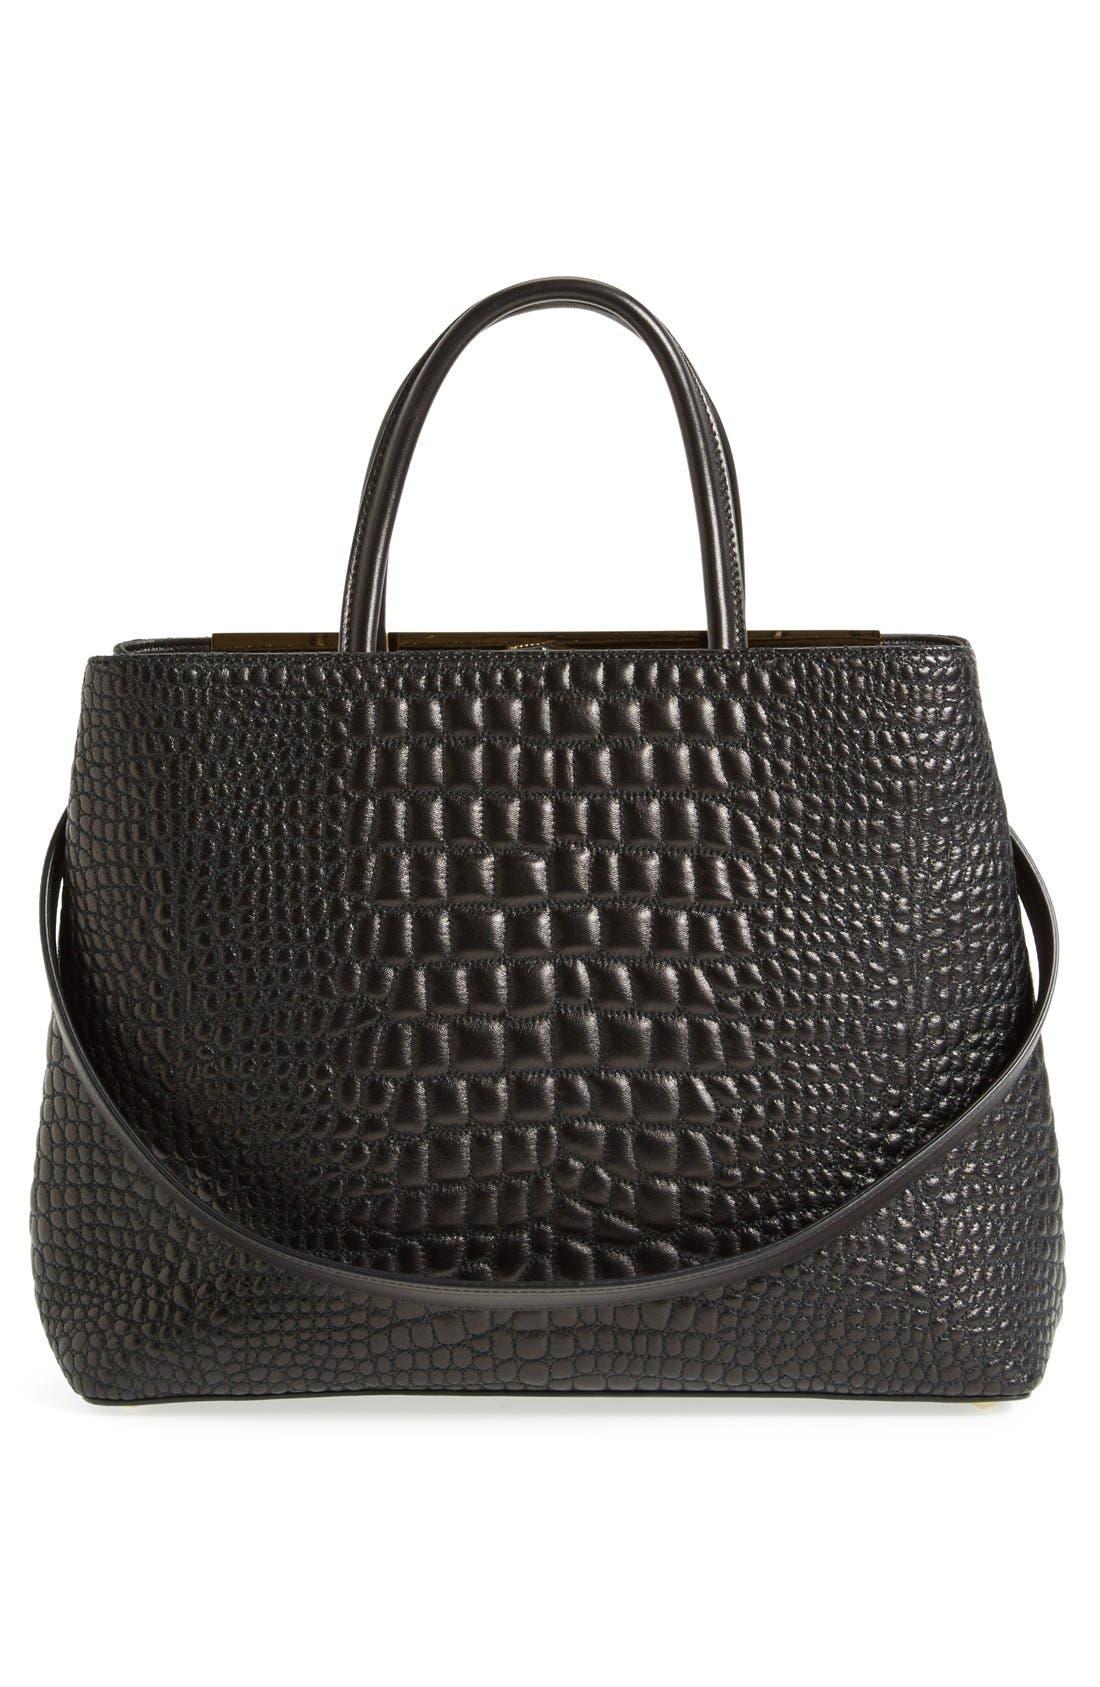 Alternate Image 3  - Fendi 'Medium 2Jours' Croc Embroidered Leather Shopper